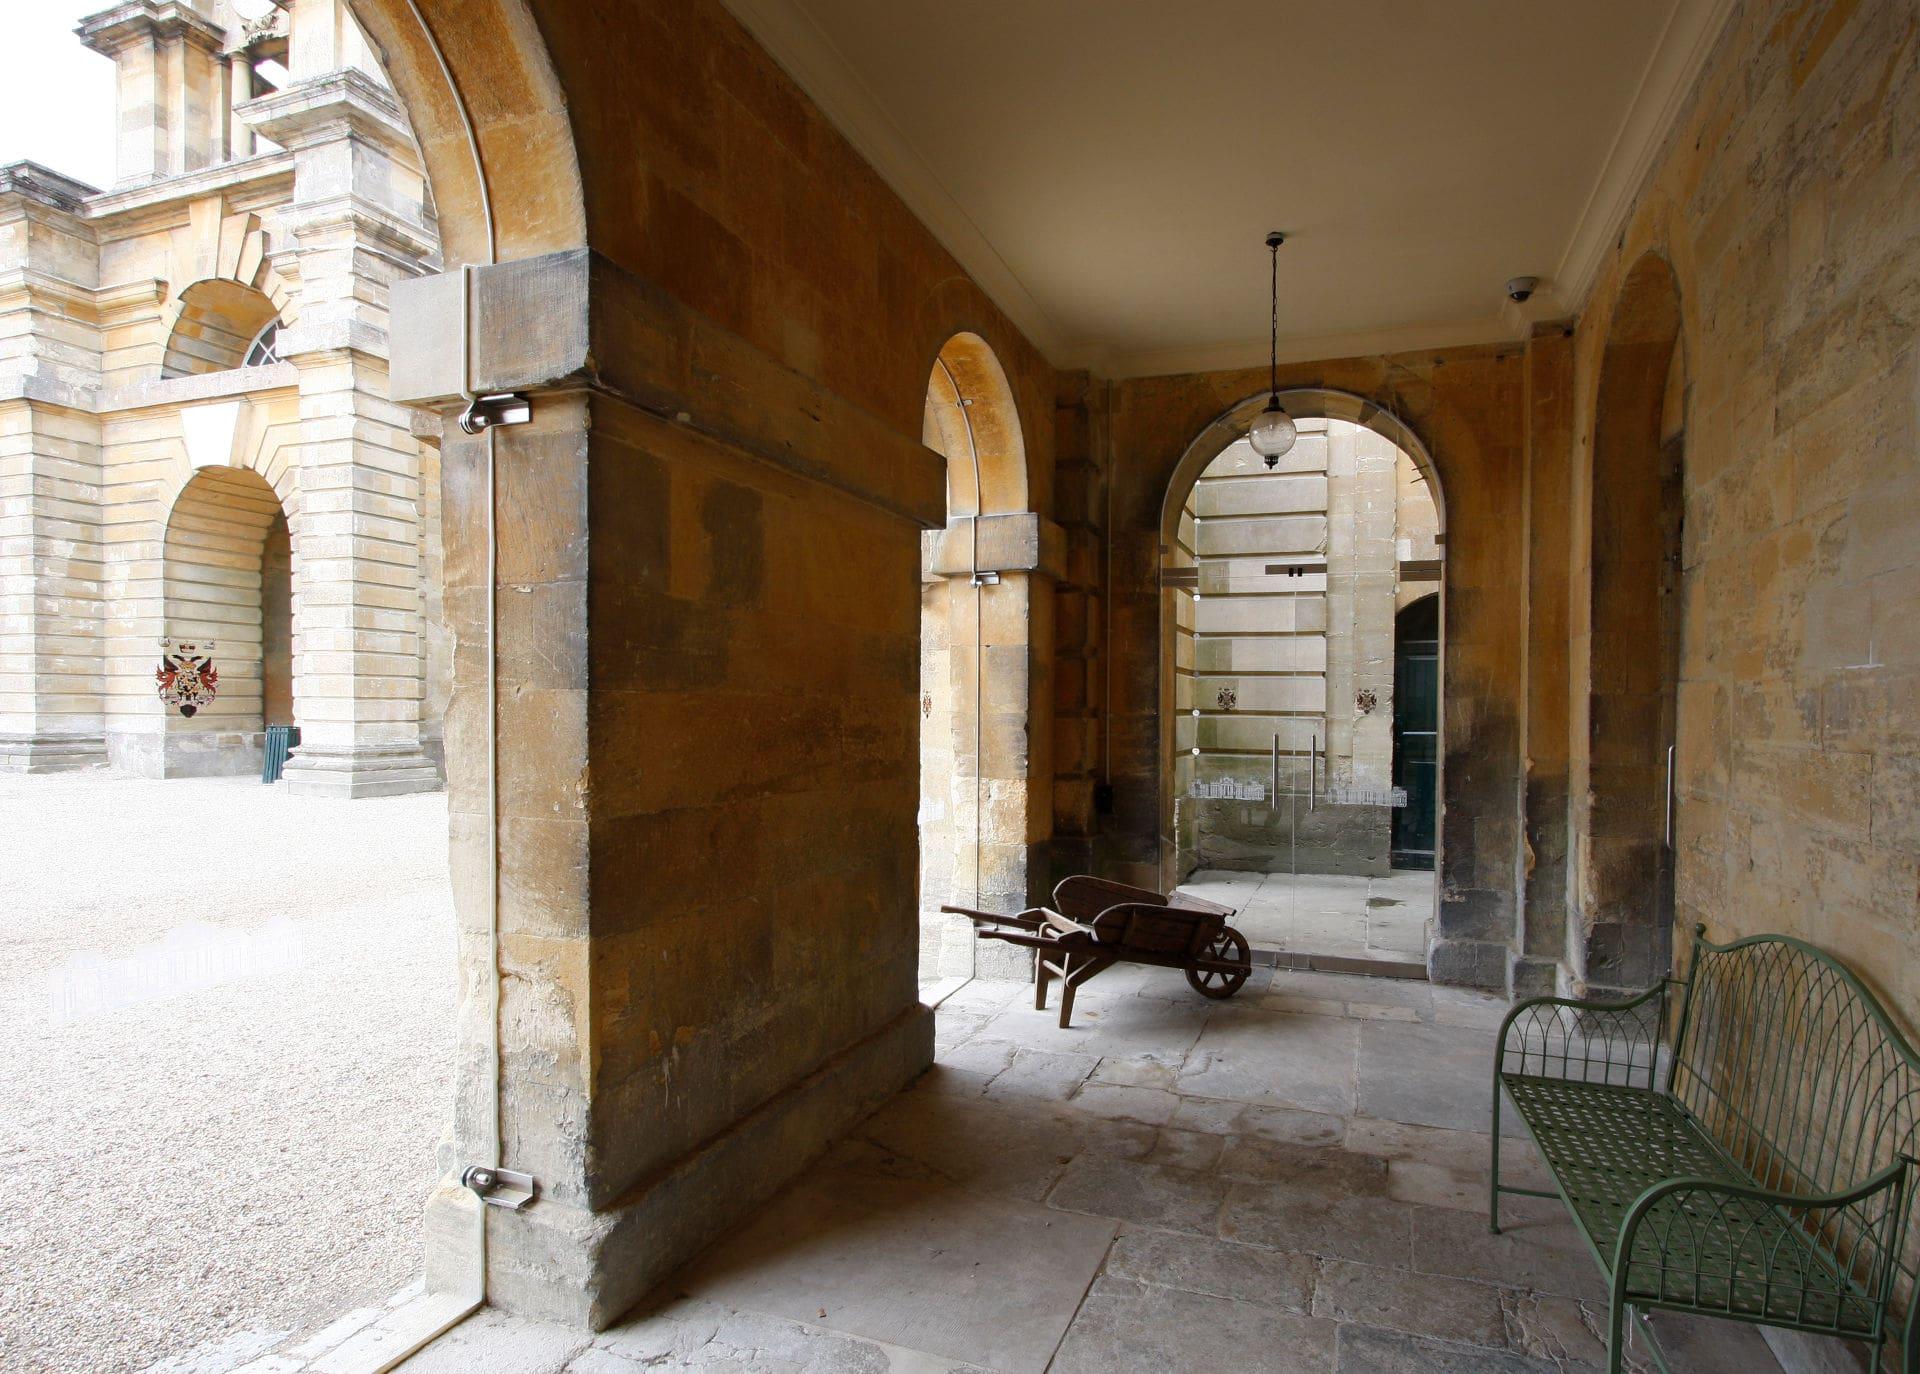 Frameless Glass to Blenheim Palace